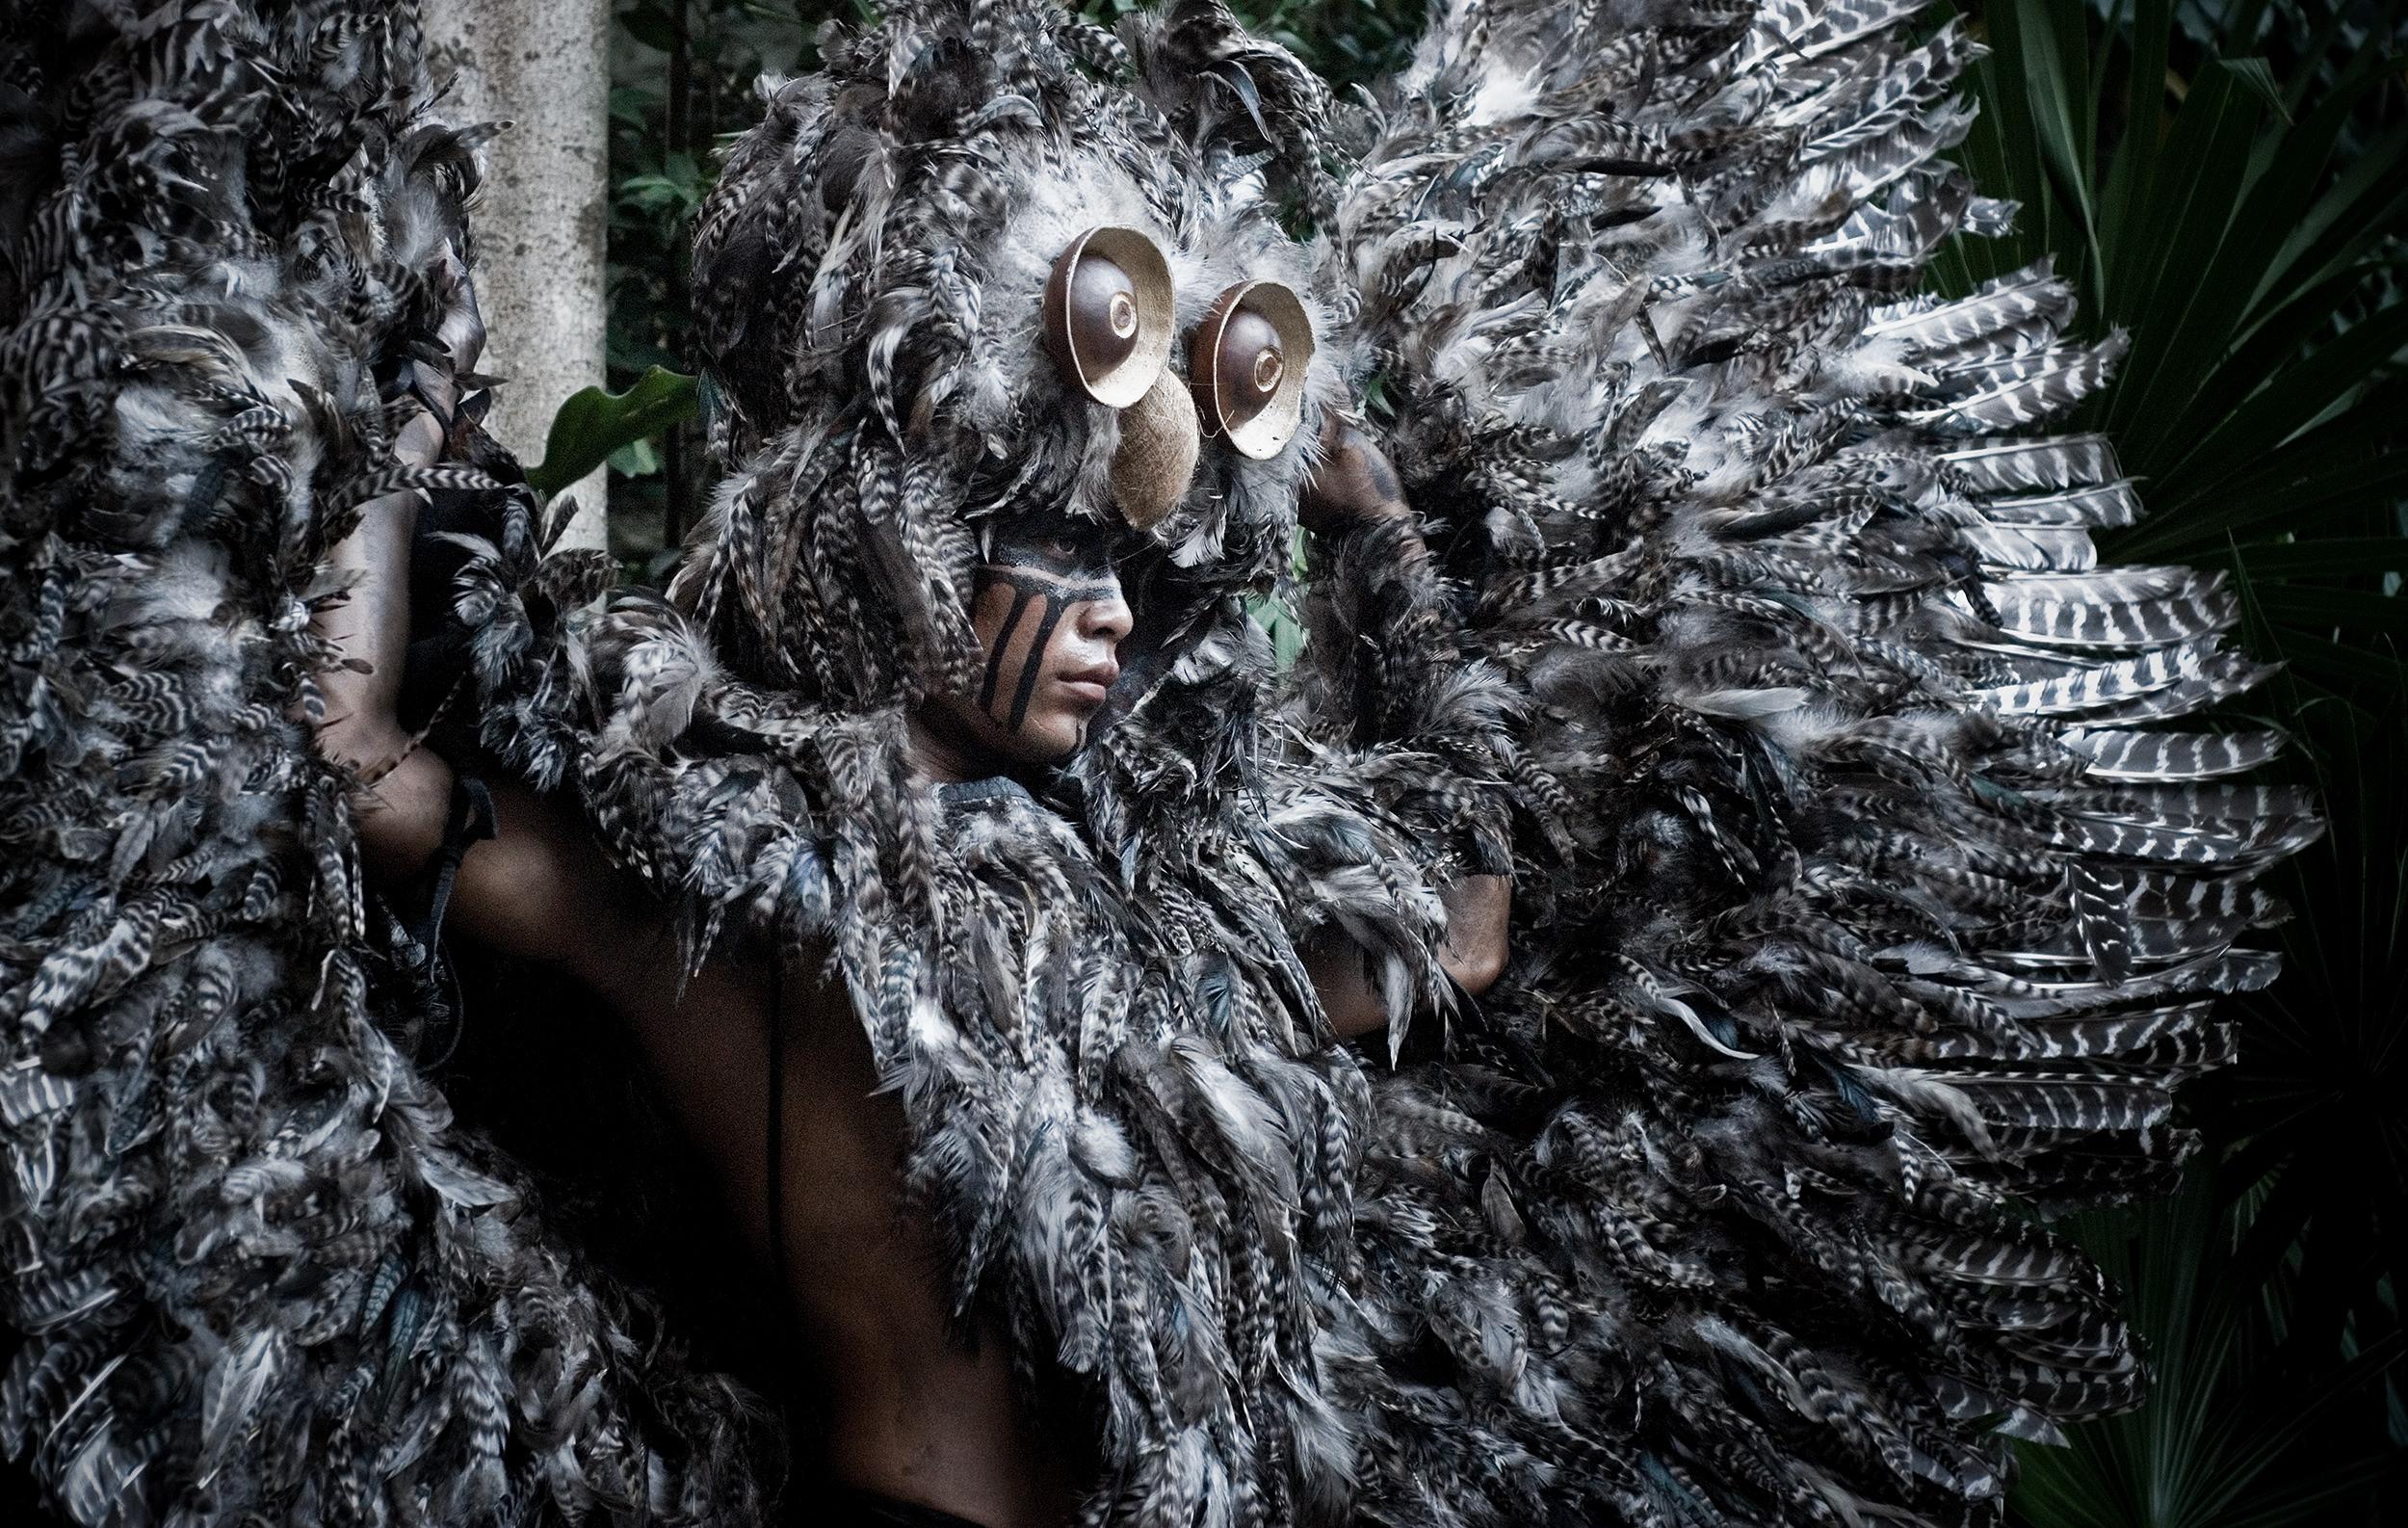 wojtek-jakubiec-photographer-montreal-mayan-mexico-documentary-Xcaret-showman.jpg